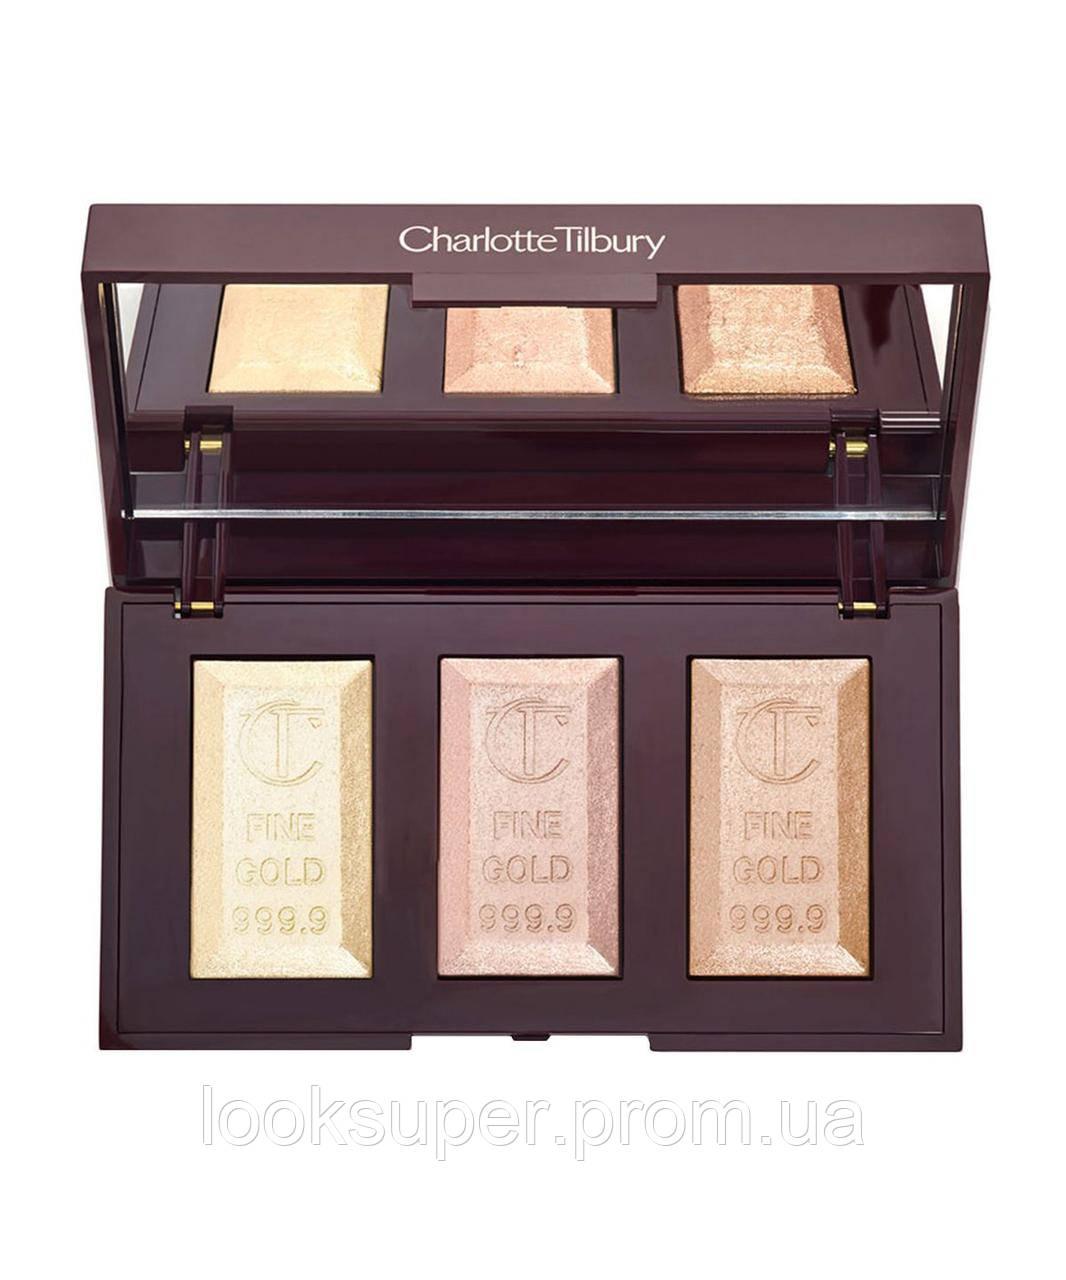 Палетка хайлайтеров Charlotte Tilbury Bar of Gold Palette (3 x 2.5g )